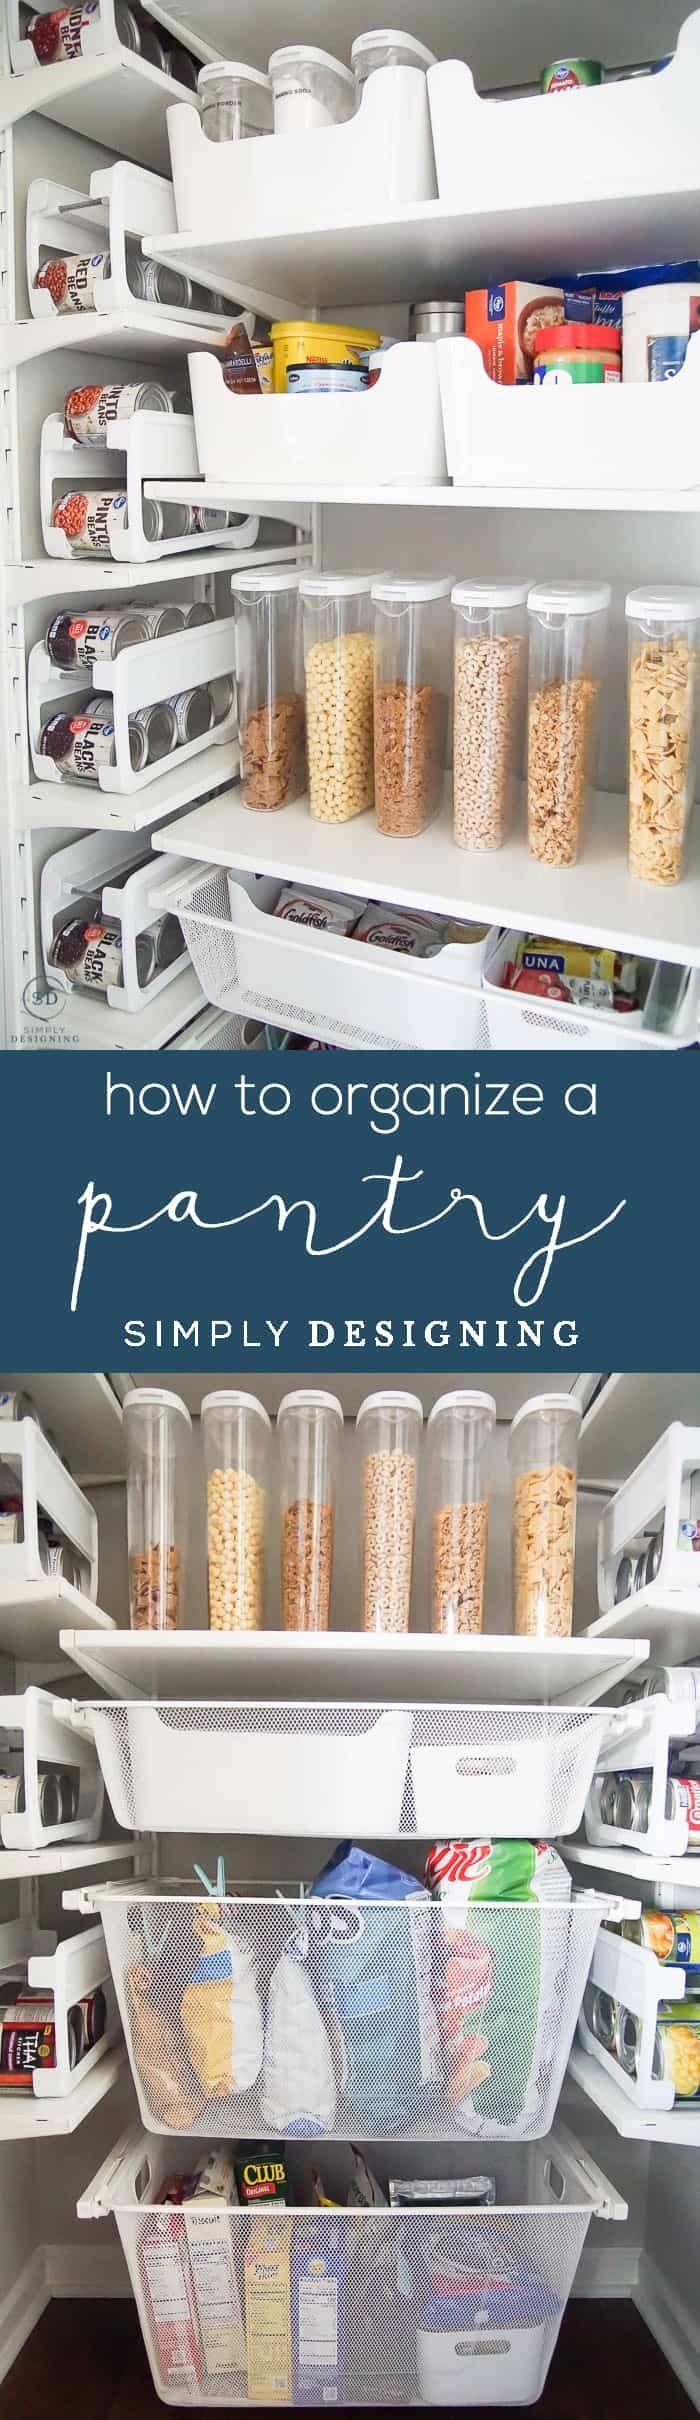 How to Organize a Closet Under the